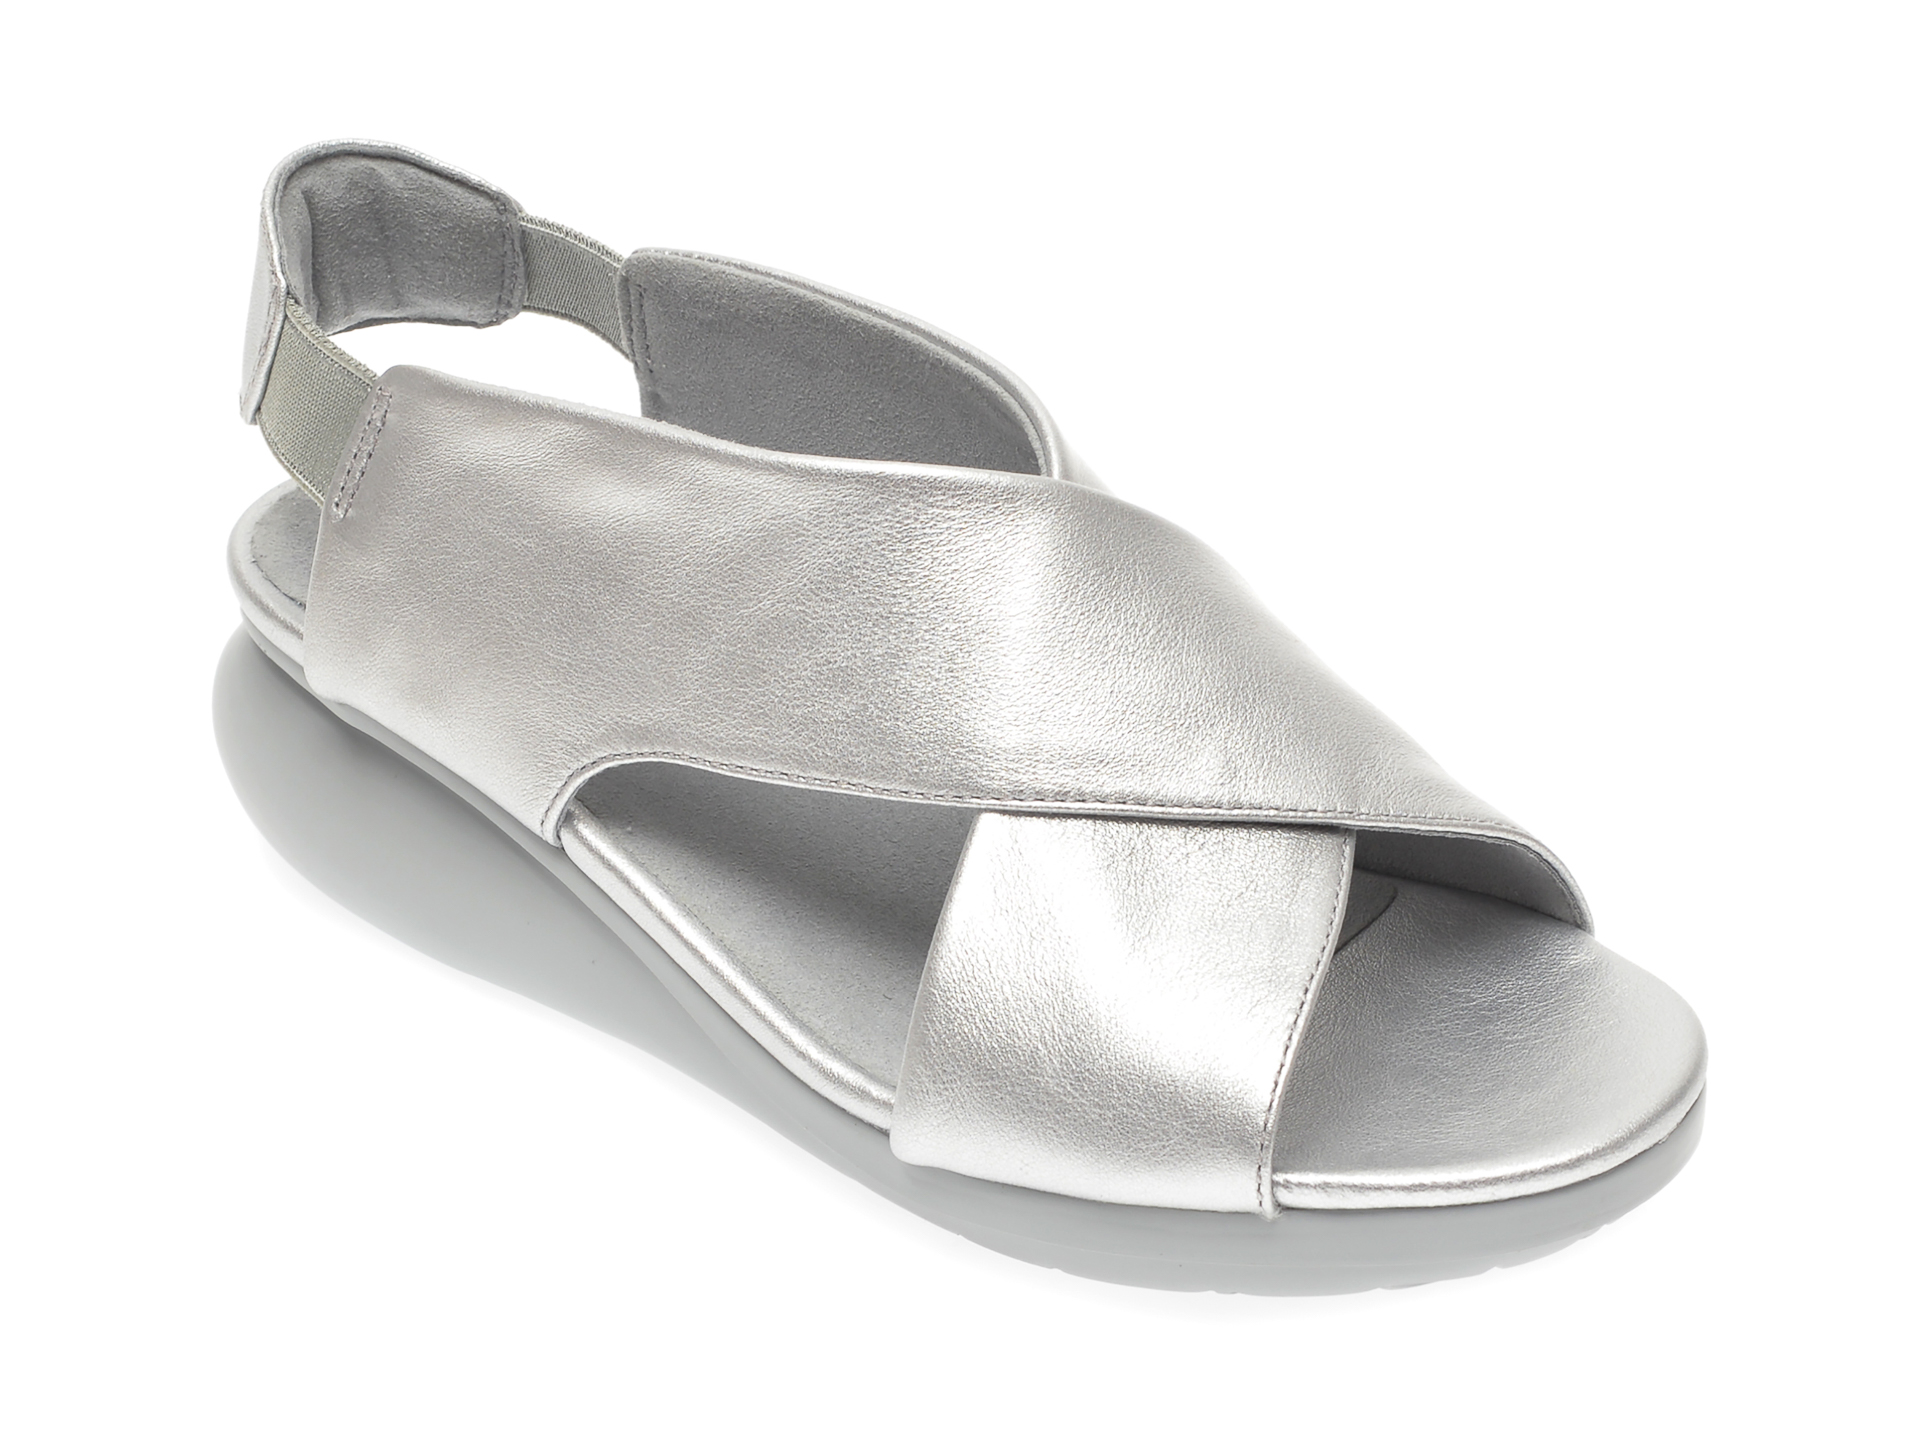 Sandale CAMPER argintii, K200066, din piele naturala imagine